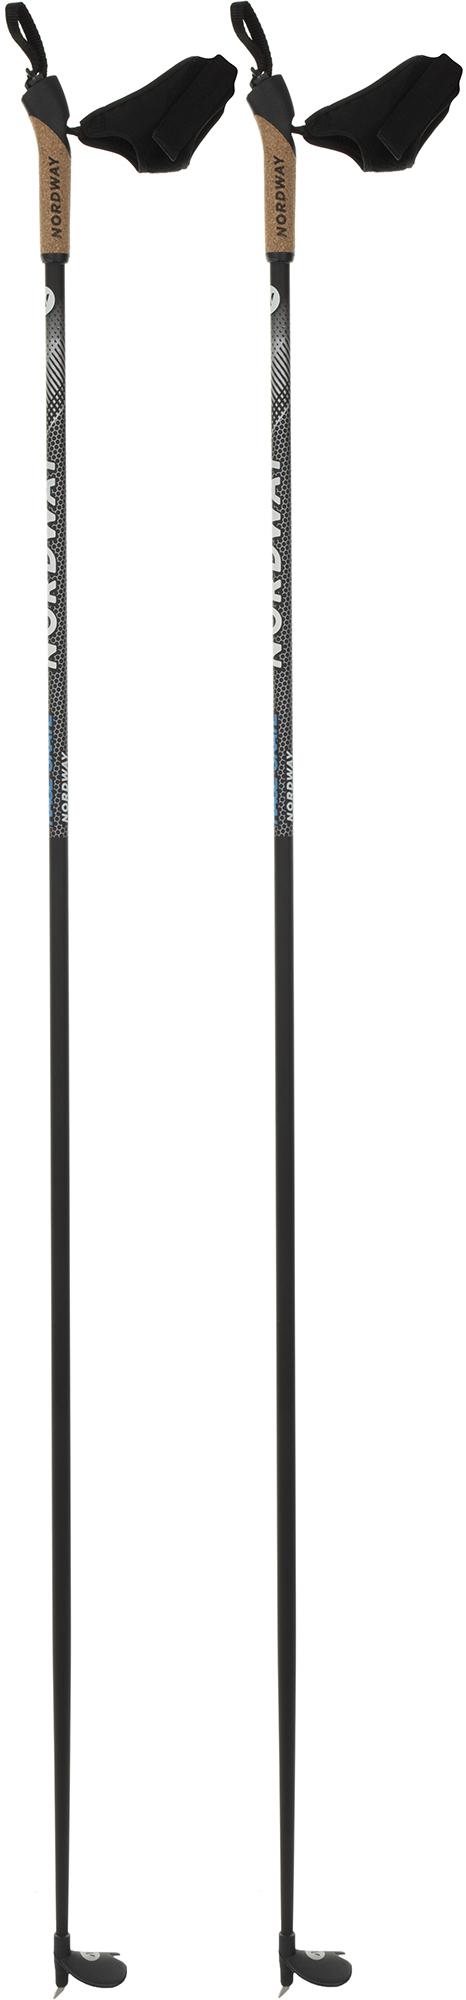 Nordway Палки для беговых лыж Race Skate Carbone